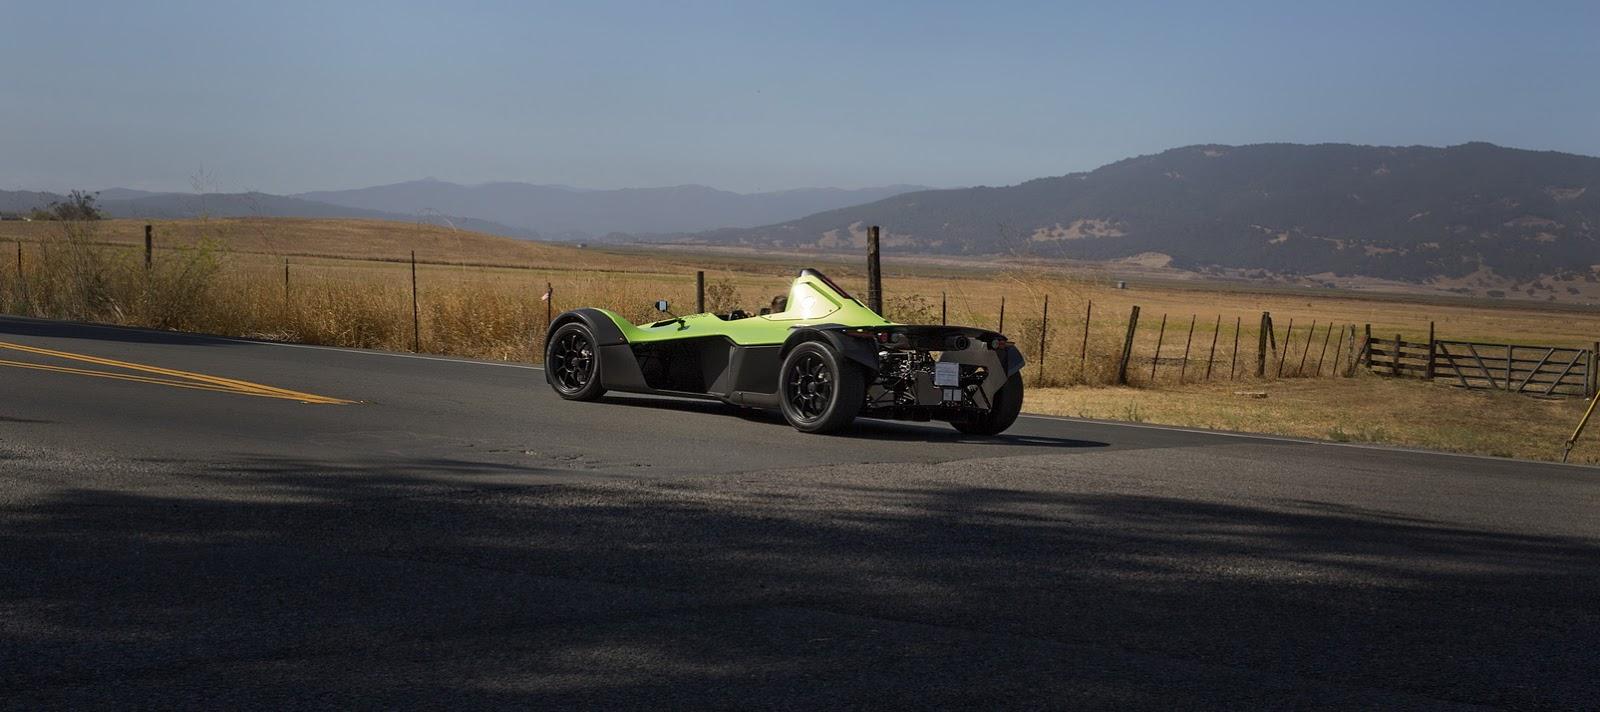 BAC mang mẫu siêu xe Mono Single-Seater Supercar tới Pebble Beach - 2